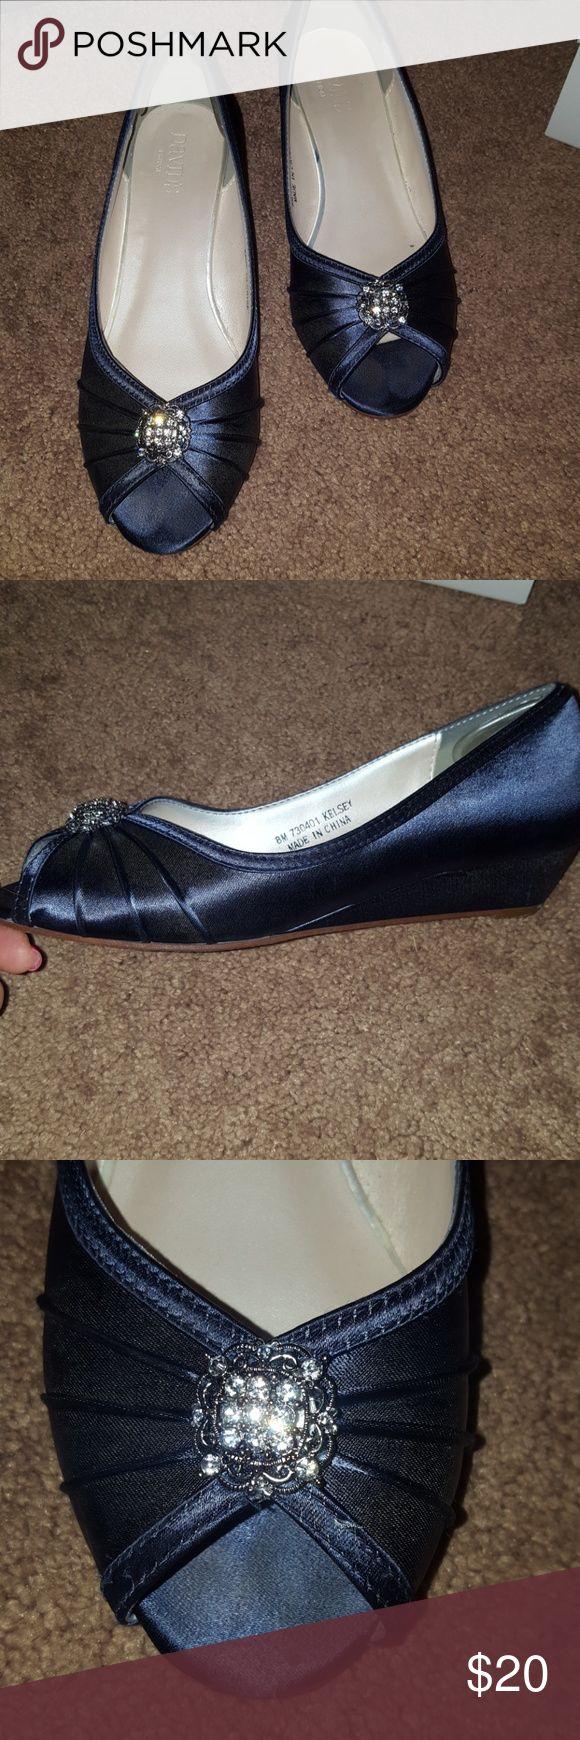 "Davids Bridal shoe size 8 marine color Davids Bridal dyeable ""Kelsey"" small heel dress shoe color is dyed Marine David's Bridal Shoes"